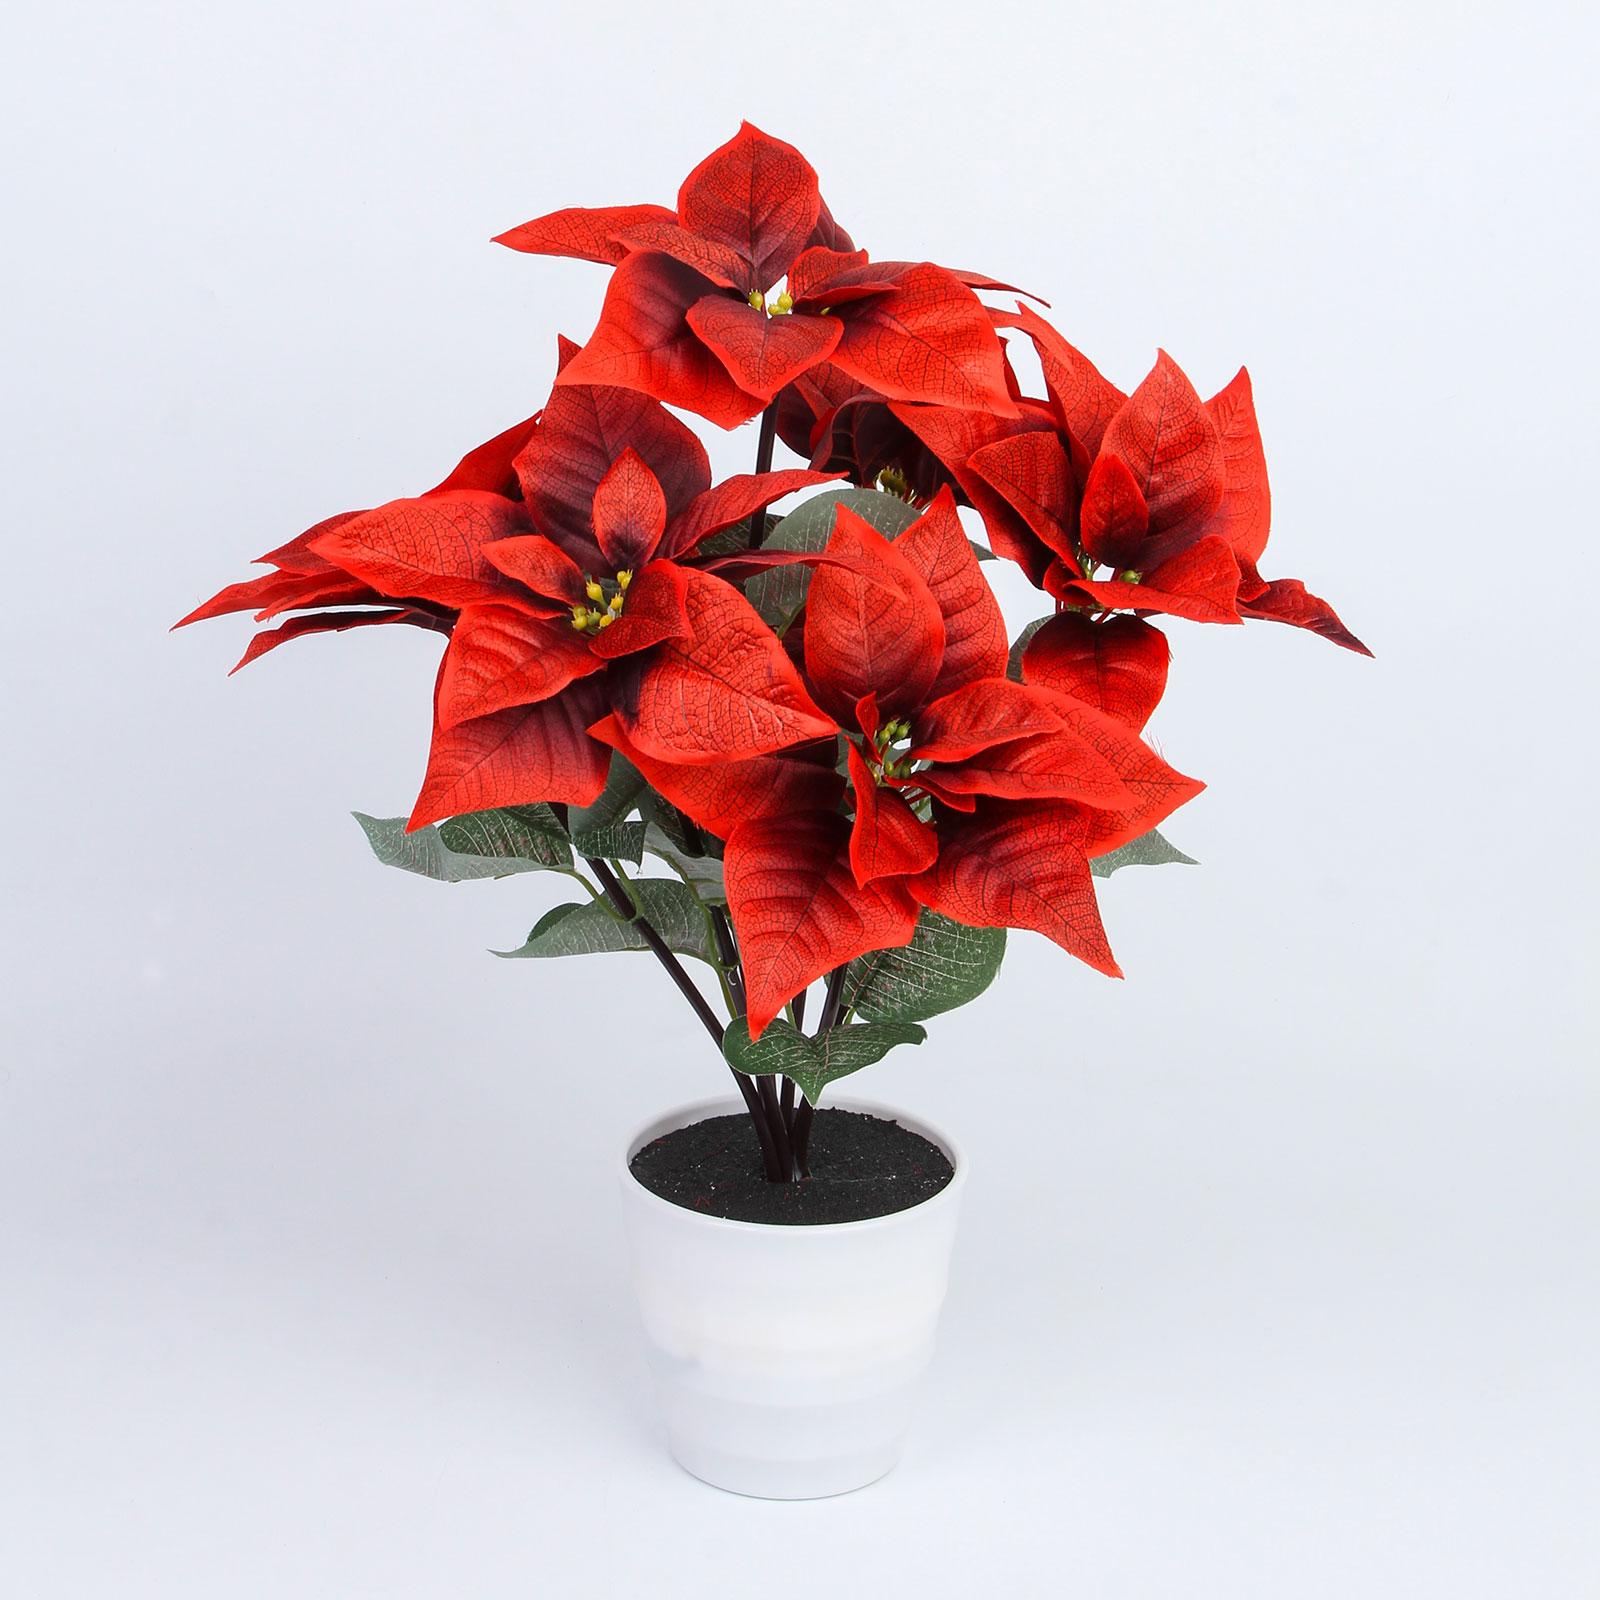 Цветок «Рождественская звезда» с подсветкой